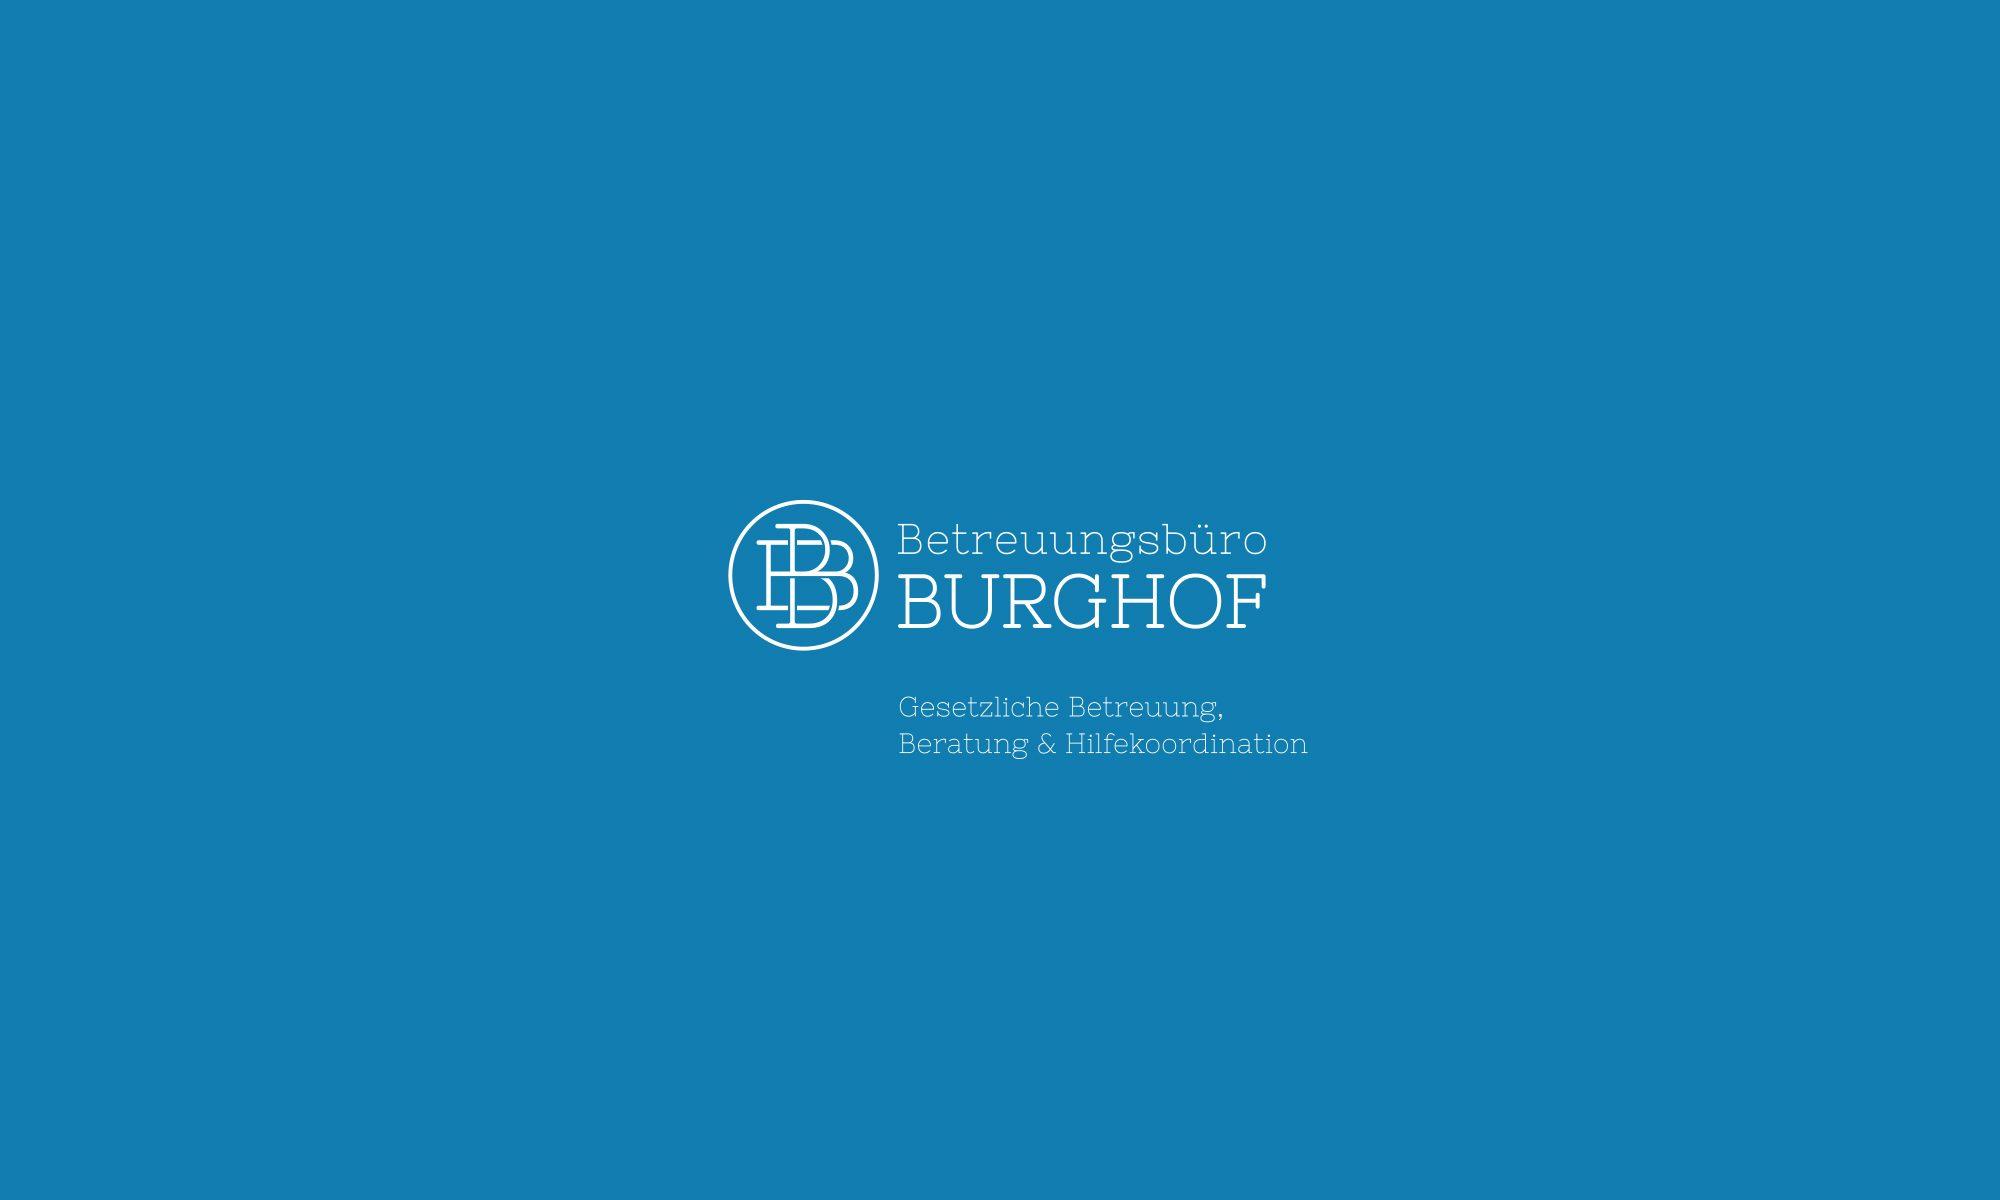 Betreuungsbüro Burghof